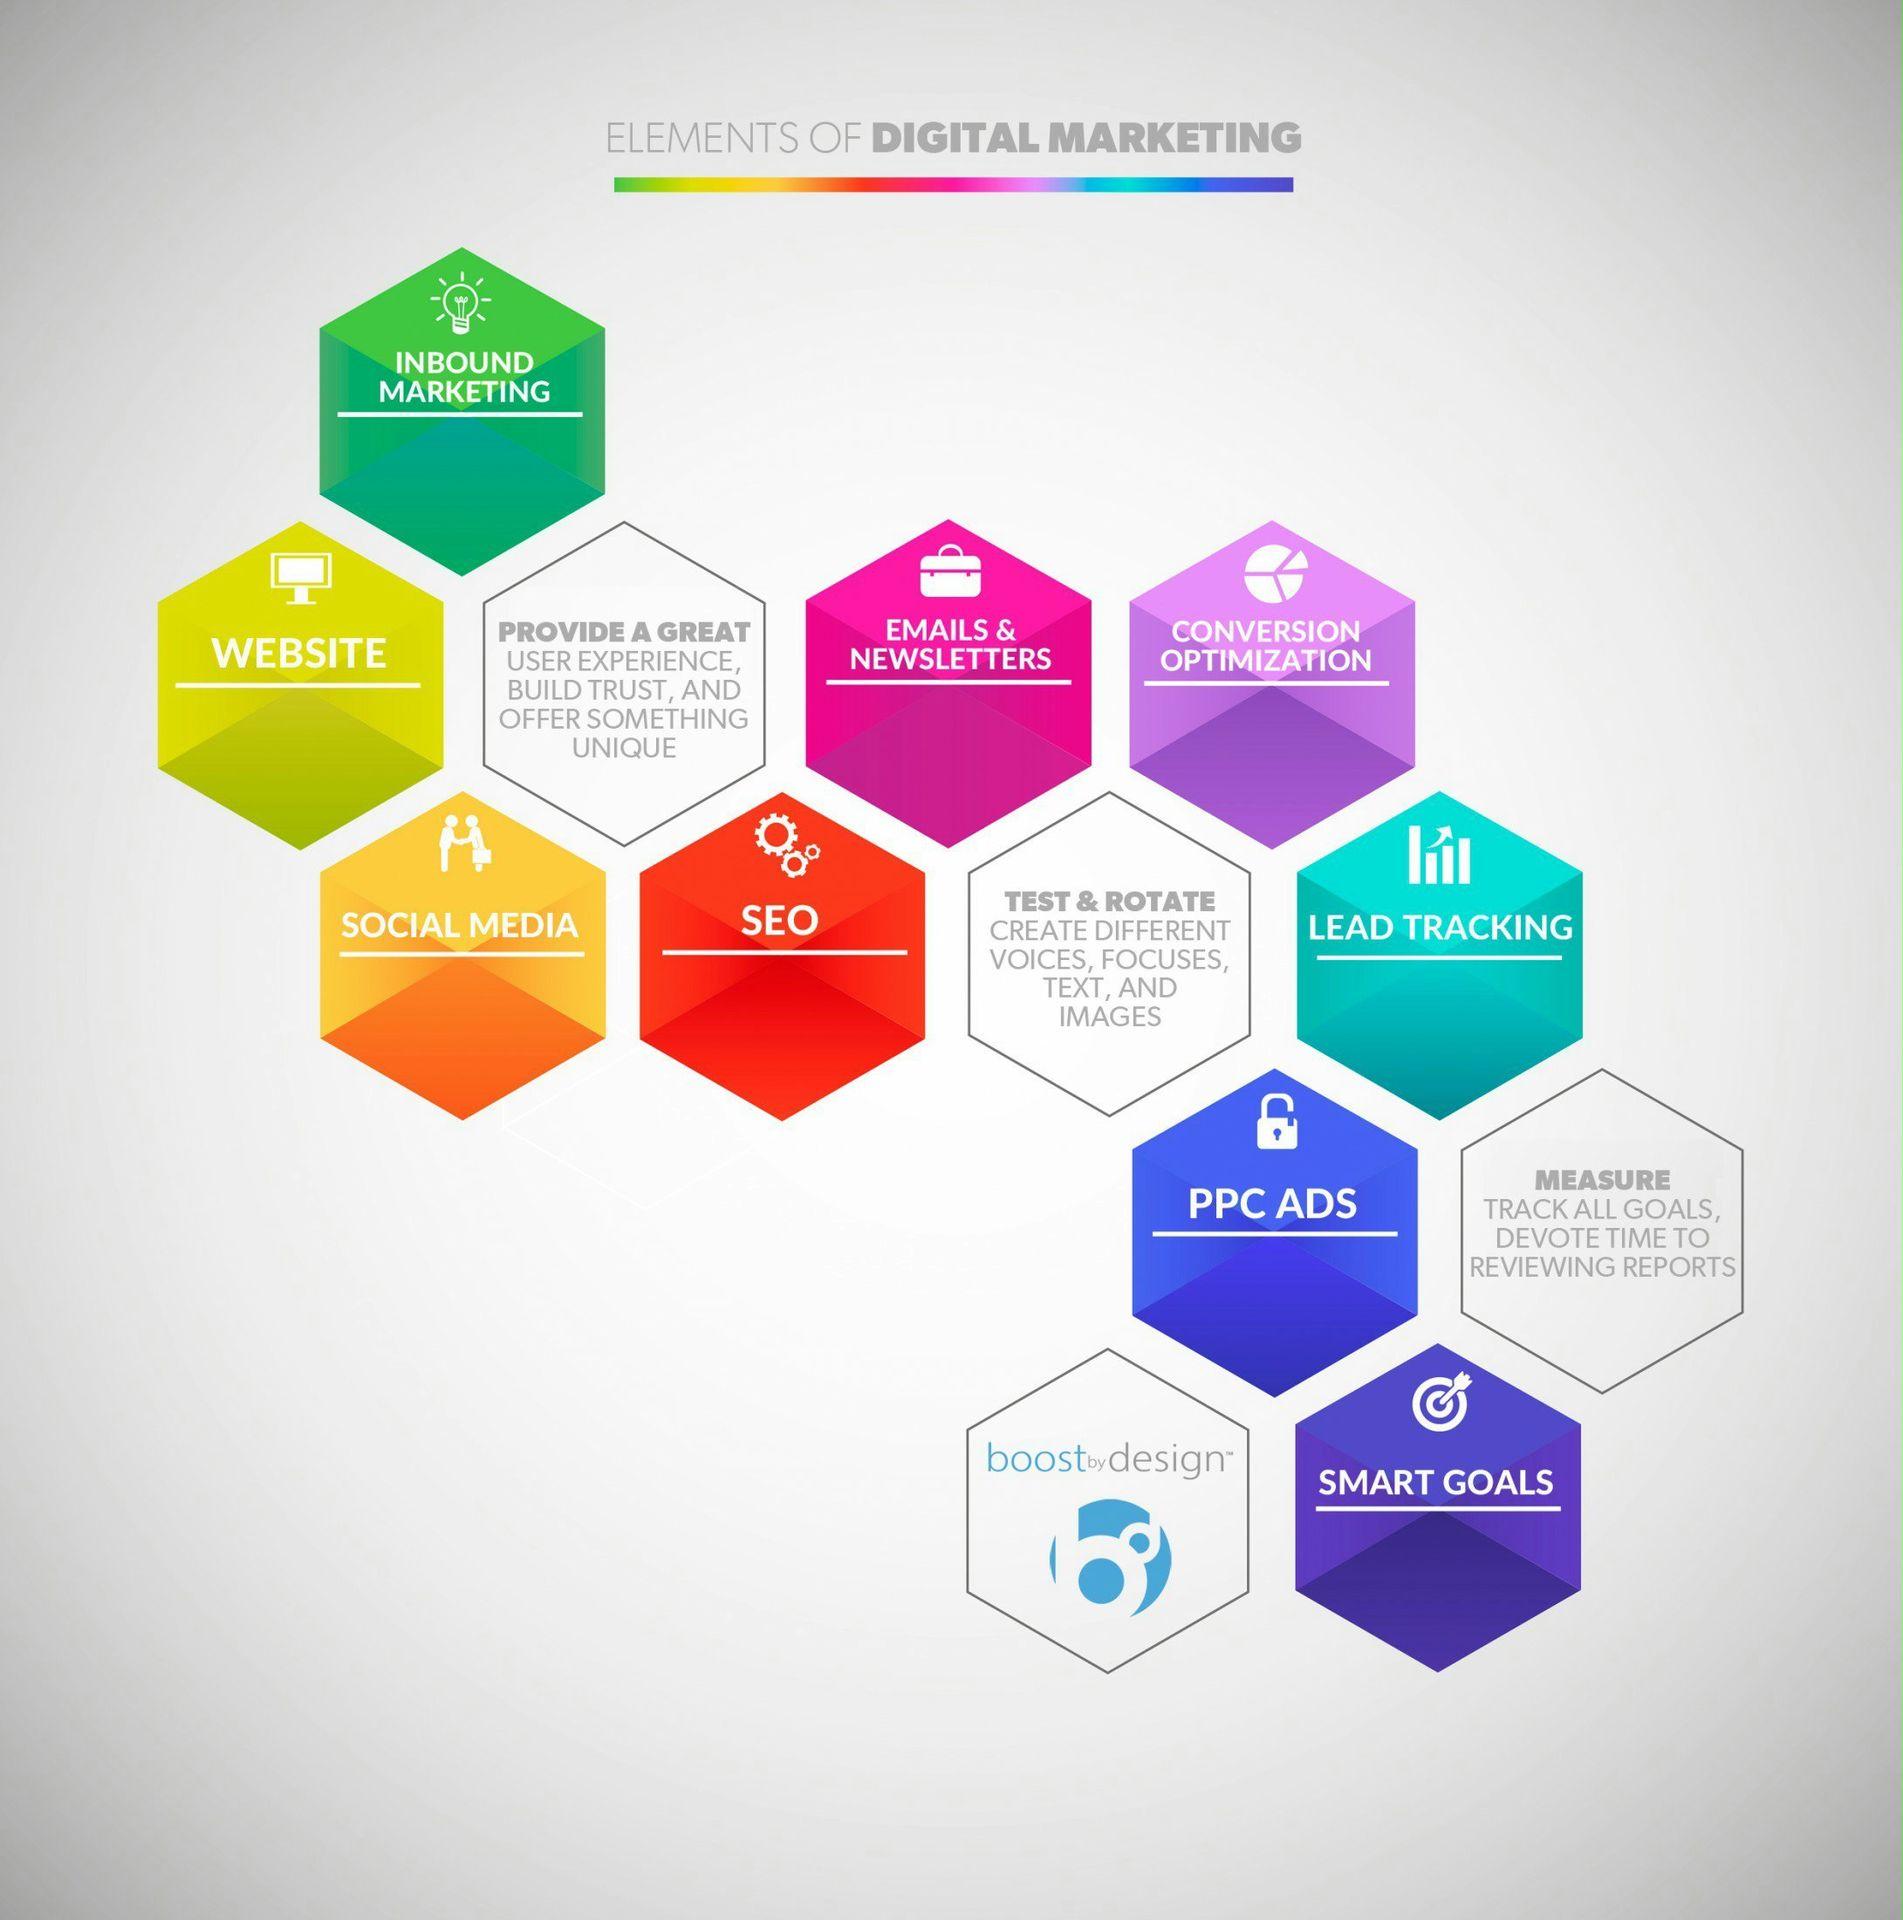 marketing_elements-digital-marketing